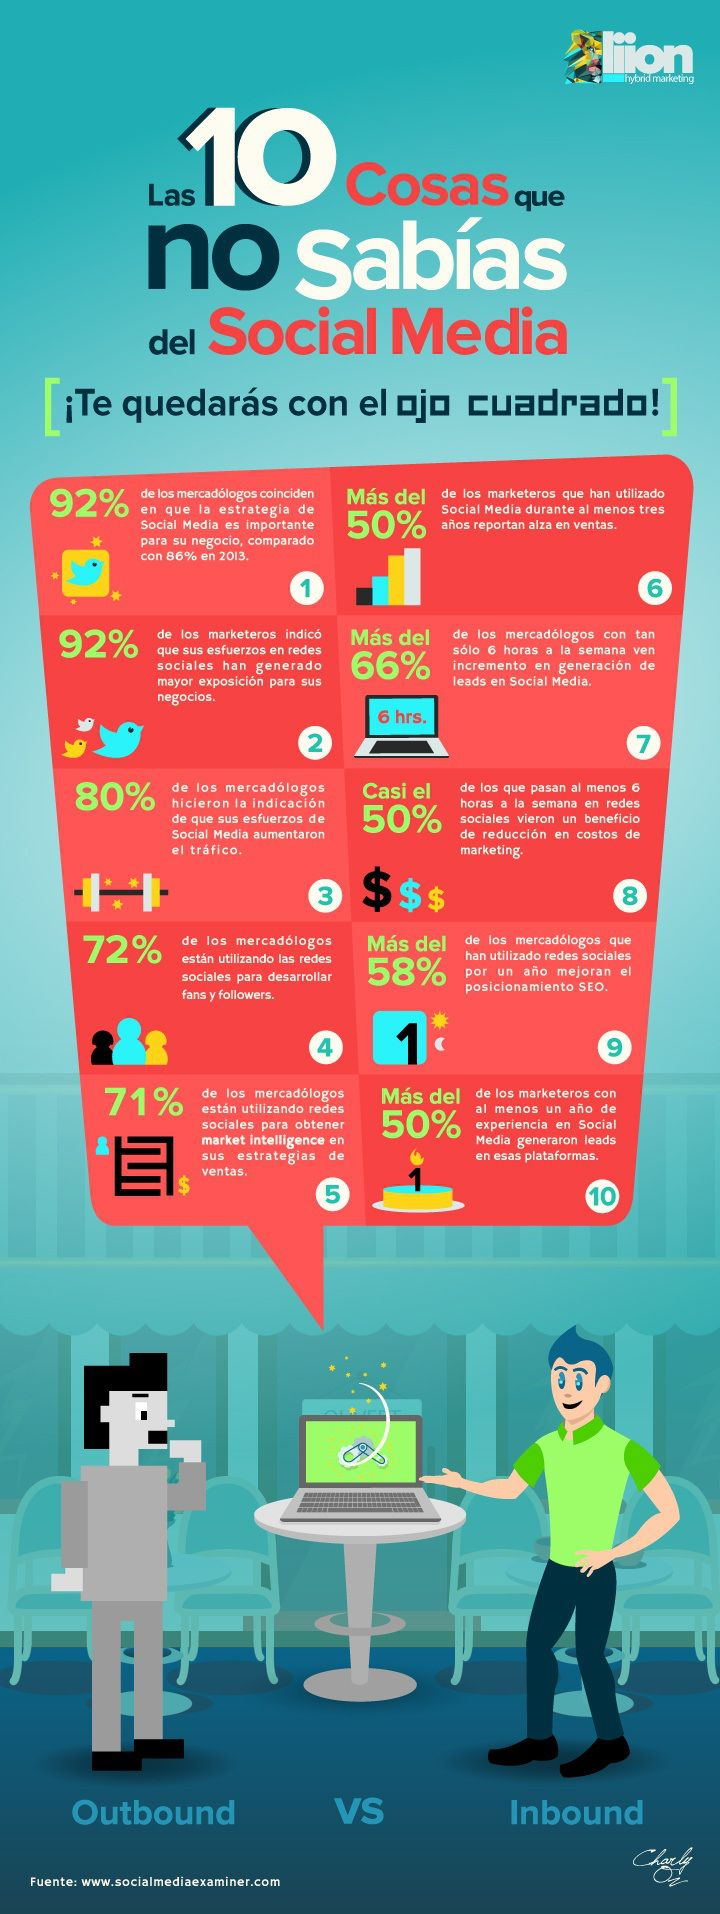 10 cosas que no sabías de Redes Sociales #infografia #infographic #socialmedia